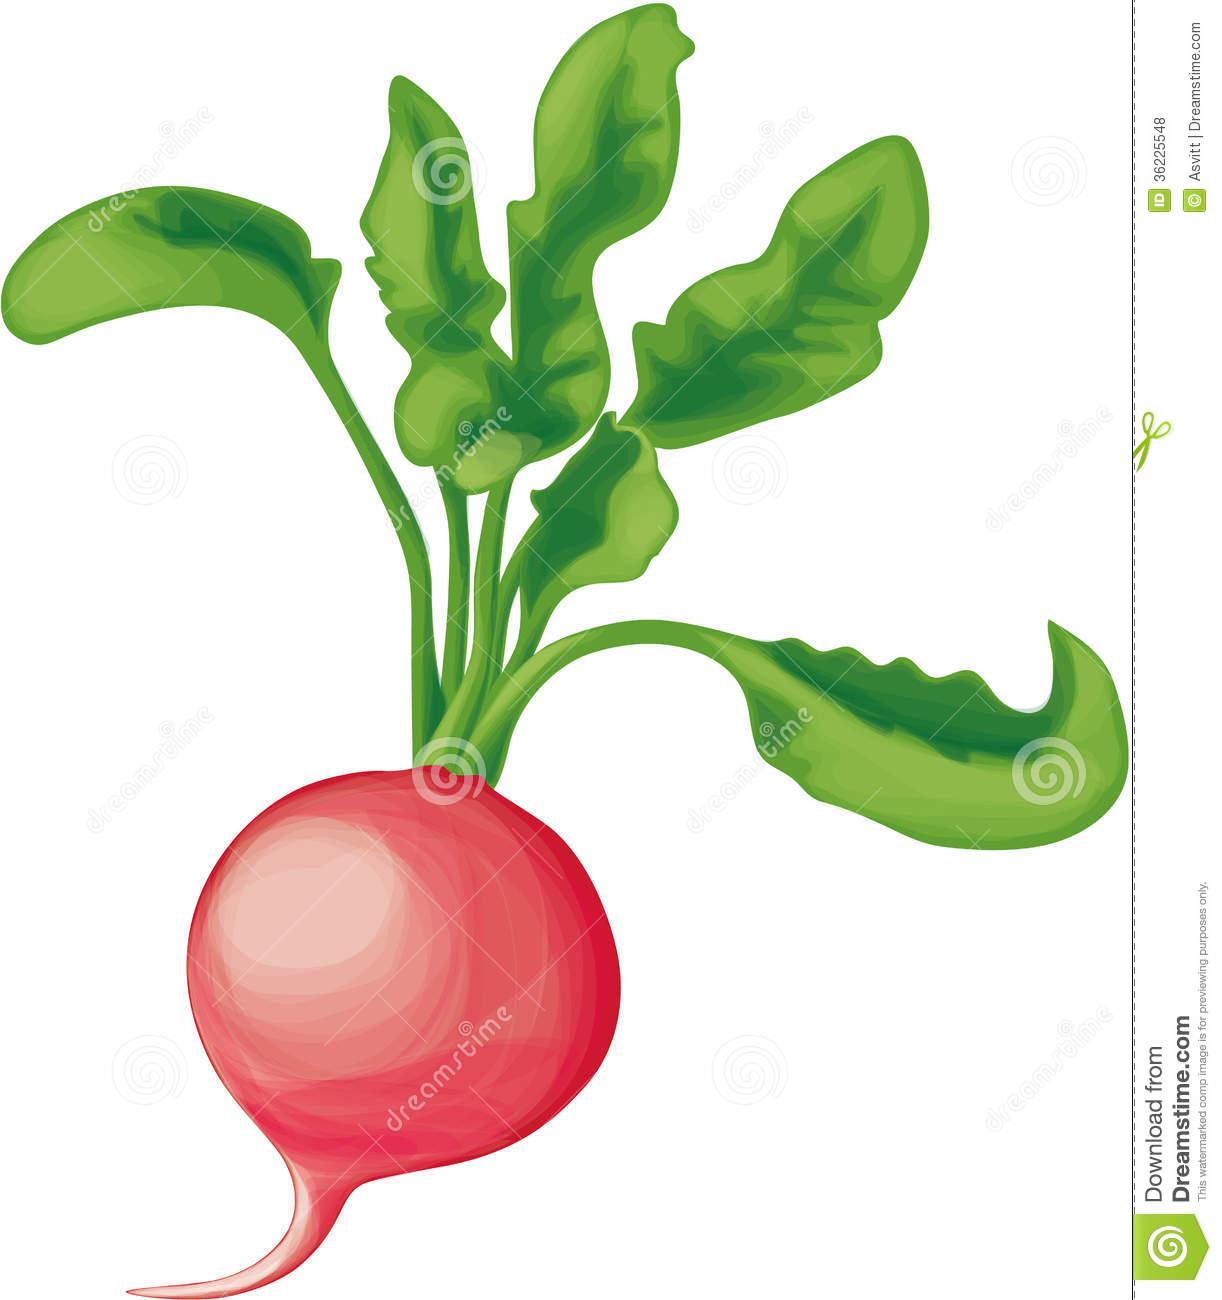 Radish clipart Clipart  About drawing radish